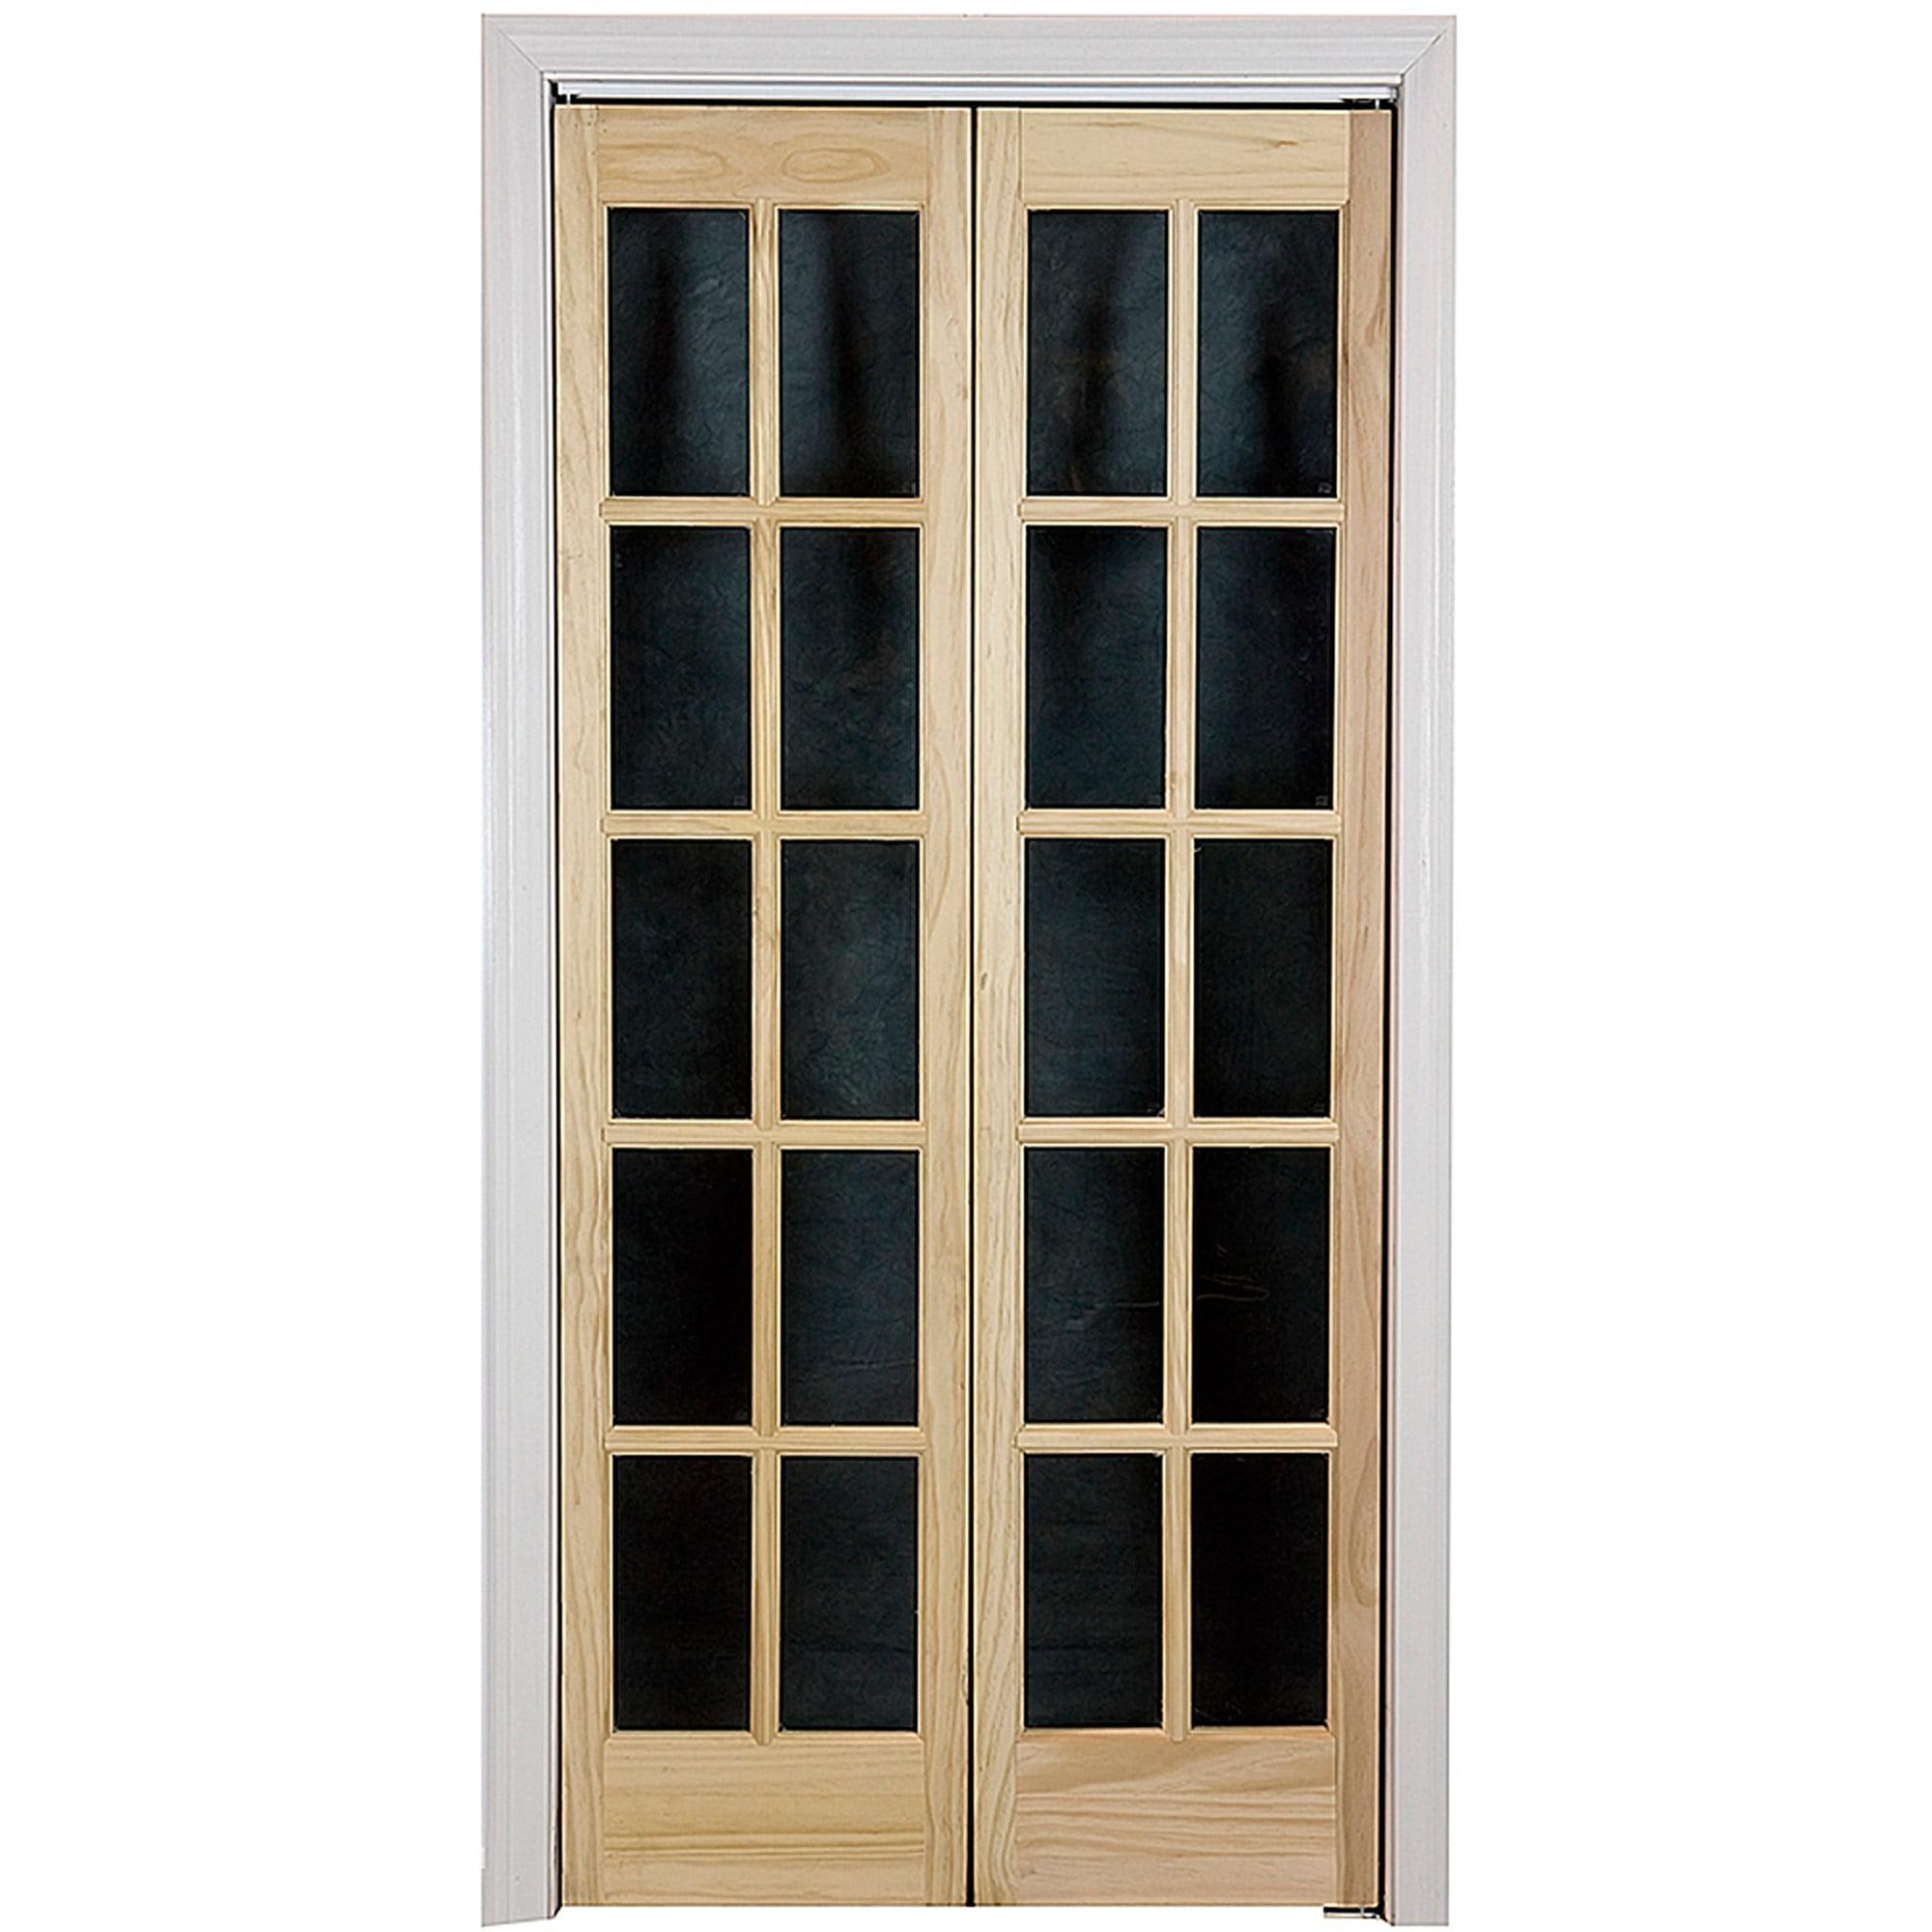 "AWC Traditional Divided Light Glass 36"" x 80.5"" Bifold Door"